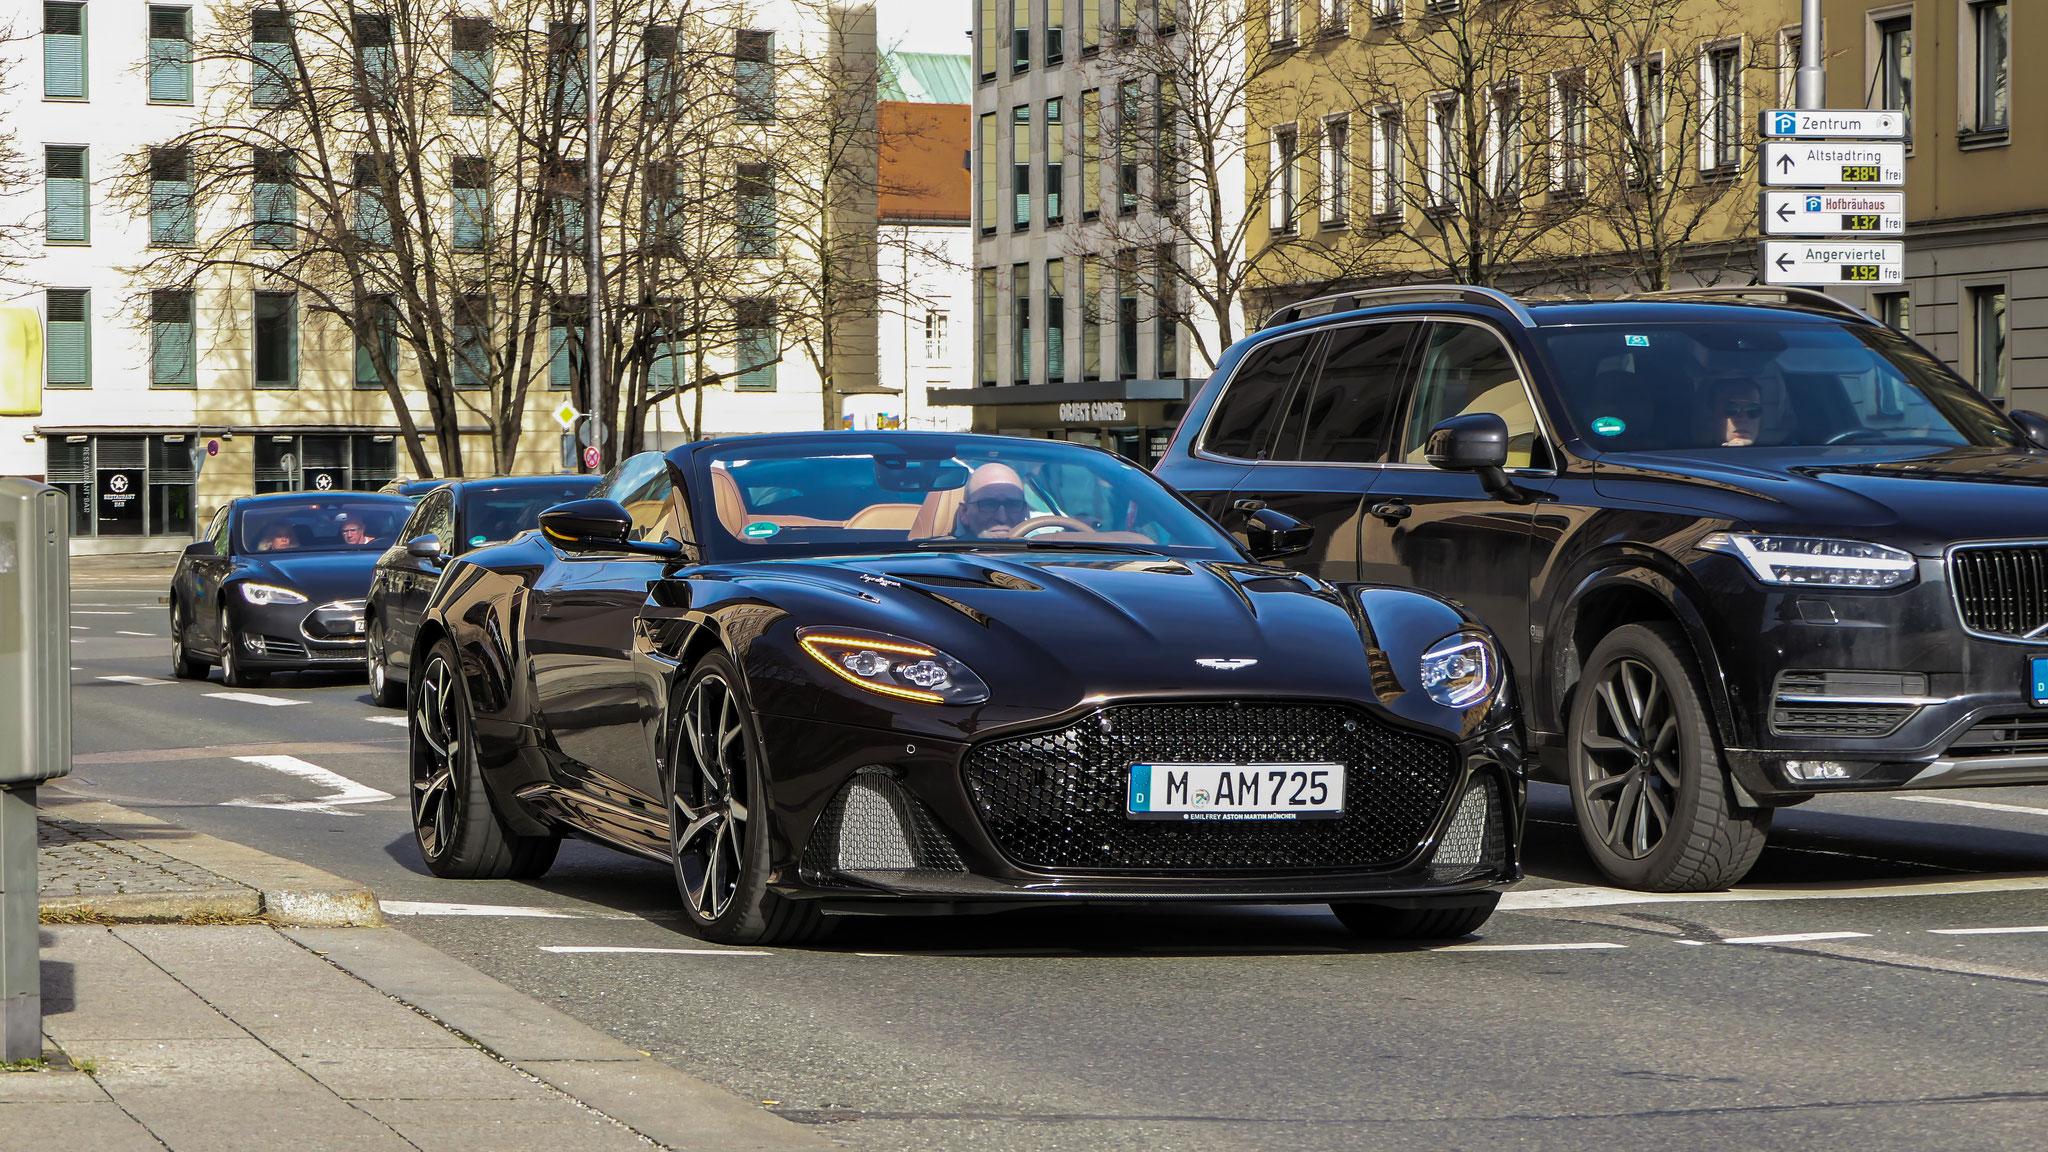 Aston Martin DBS Superleggera Volante - M-AM-725